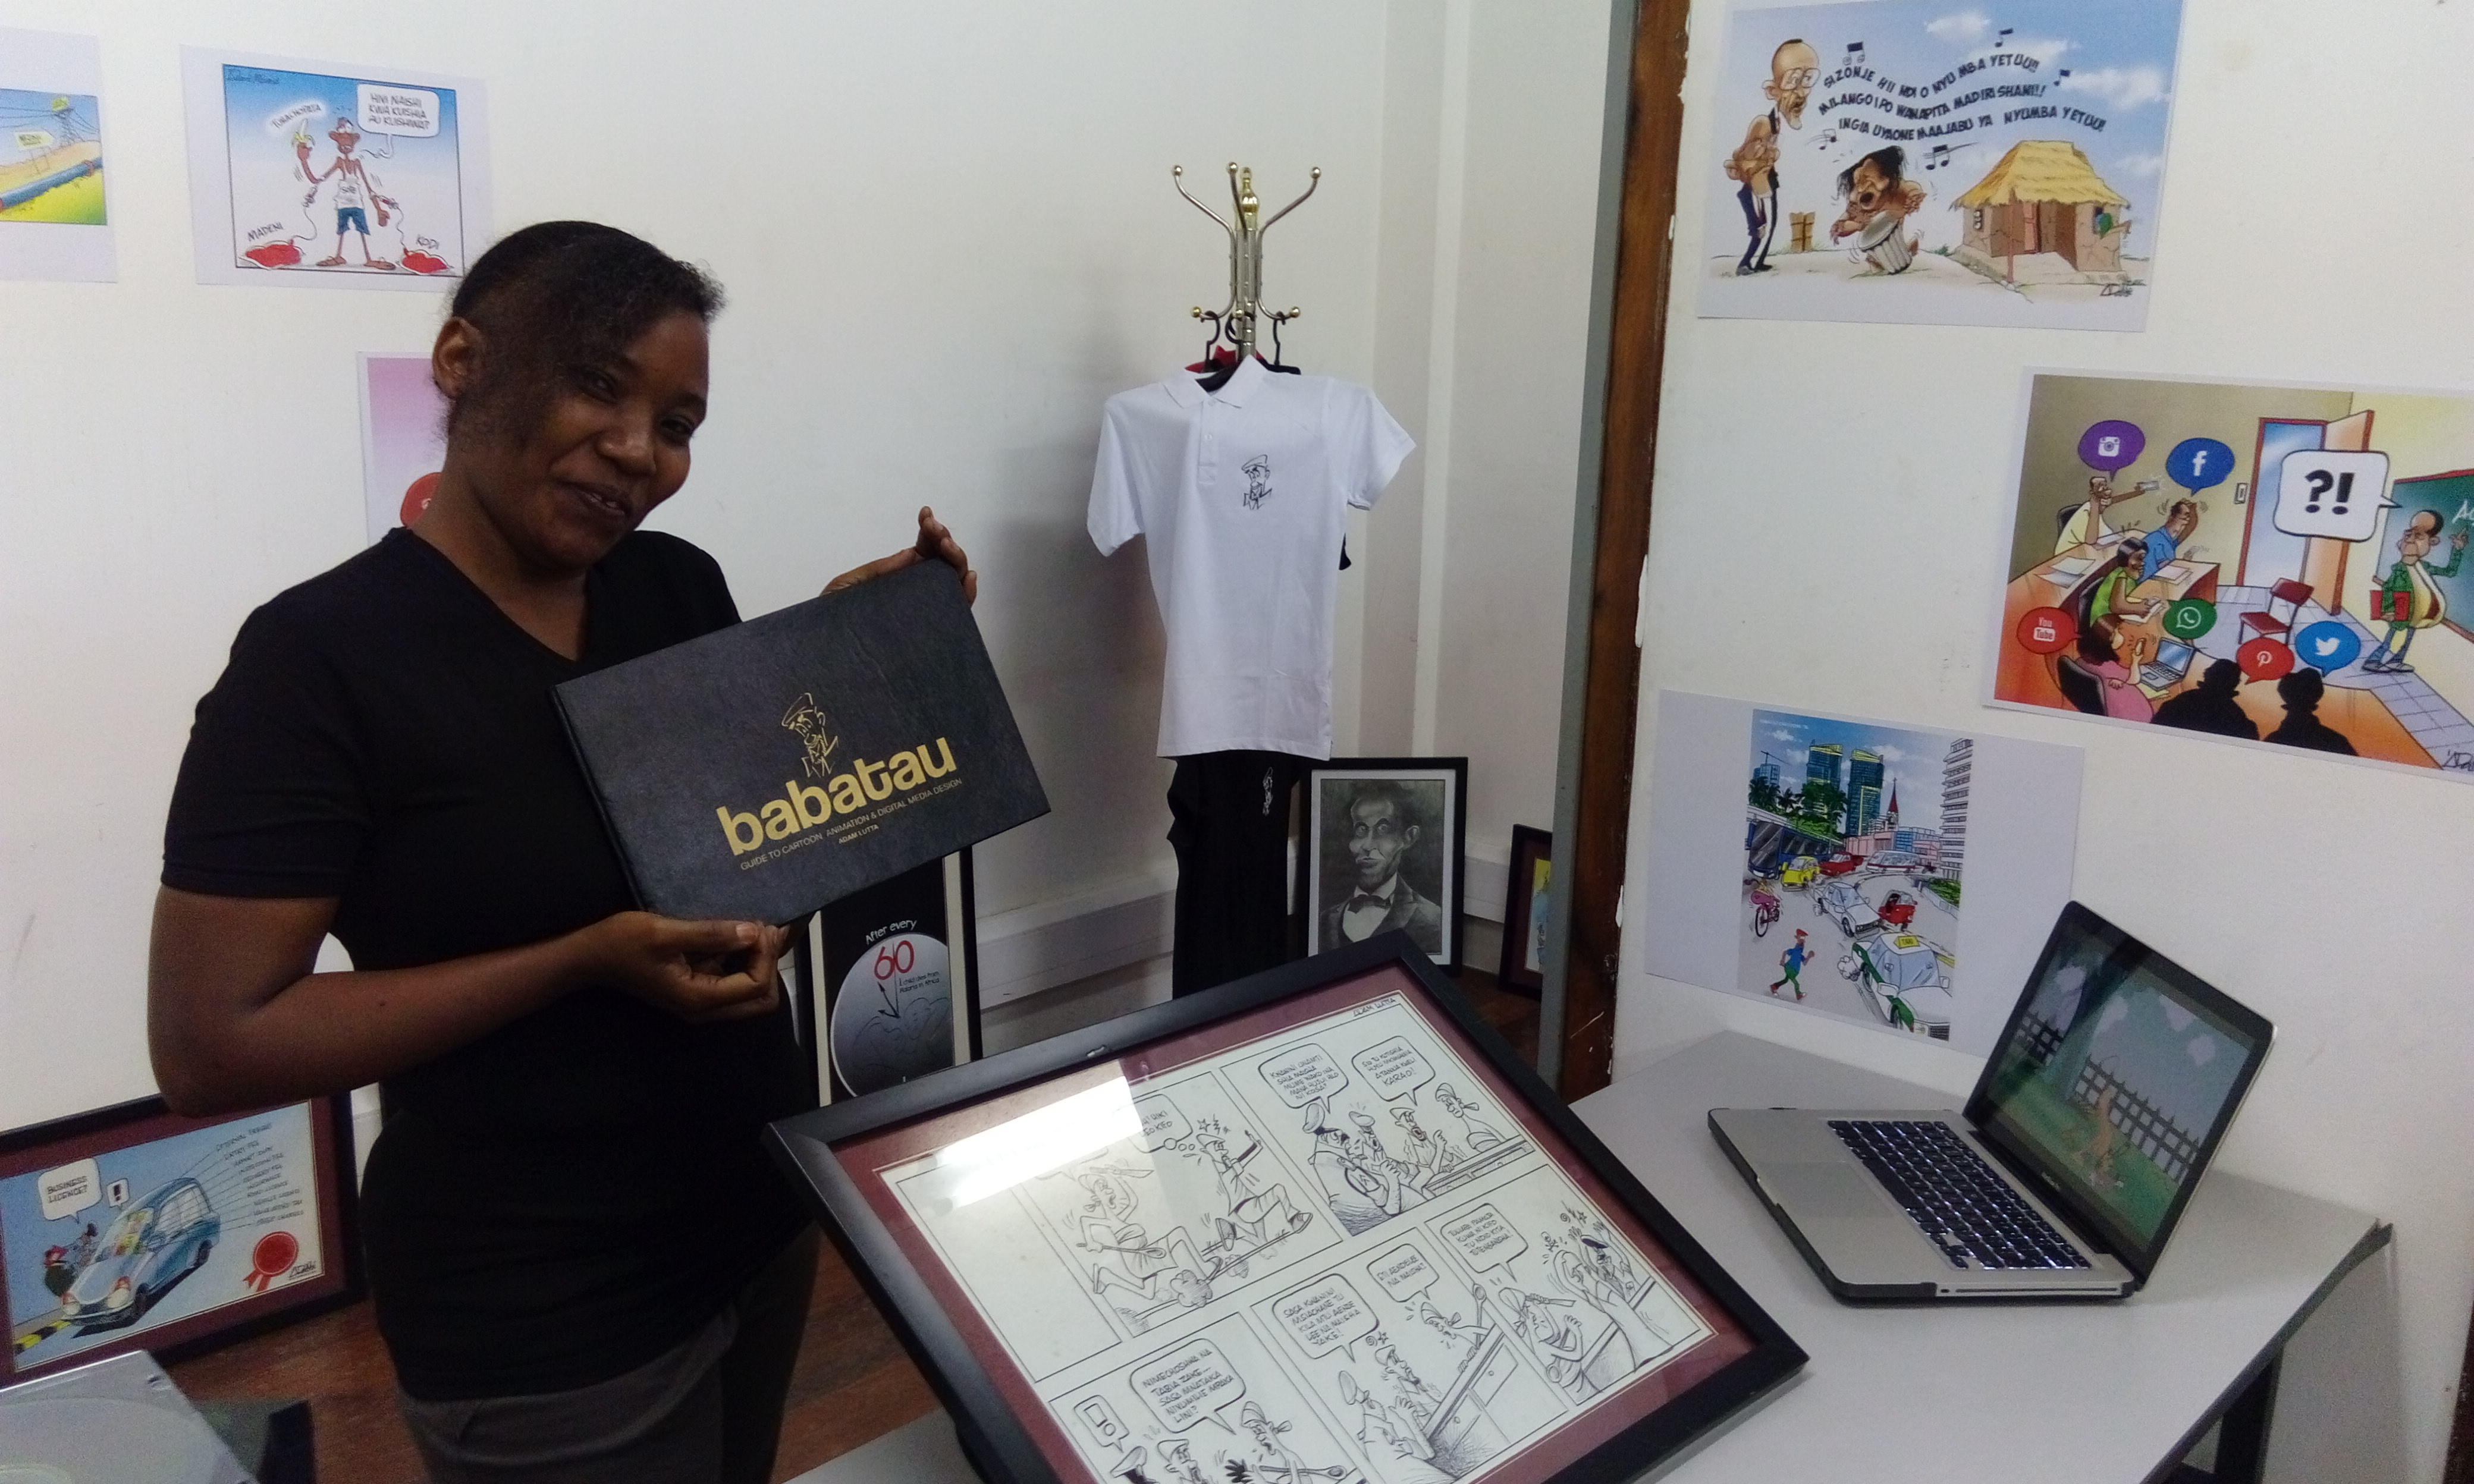 babatau brand launched